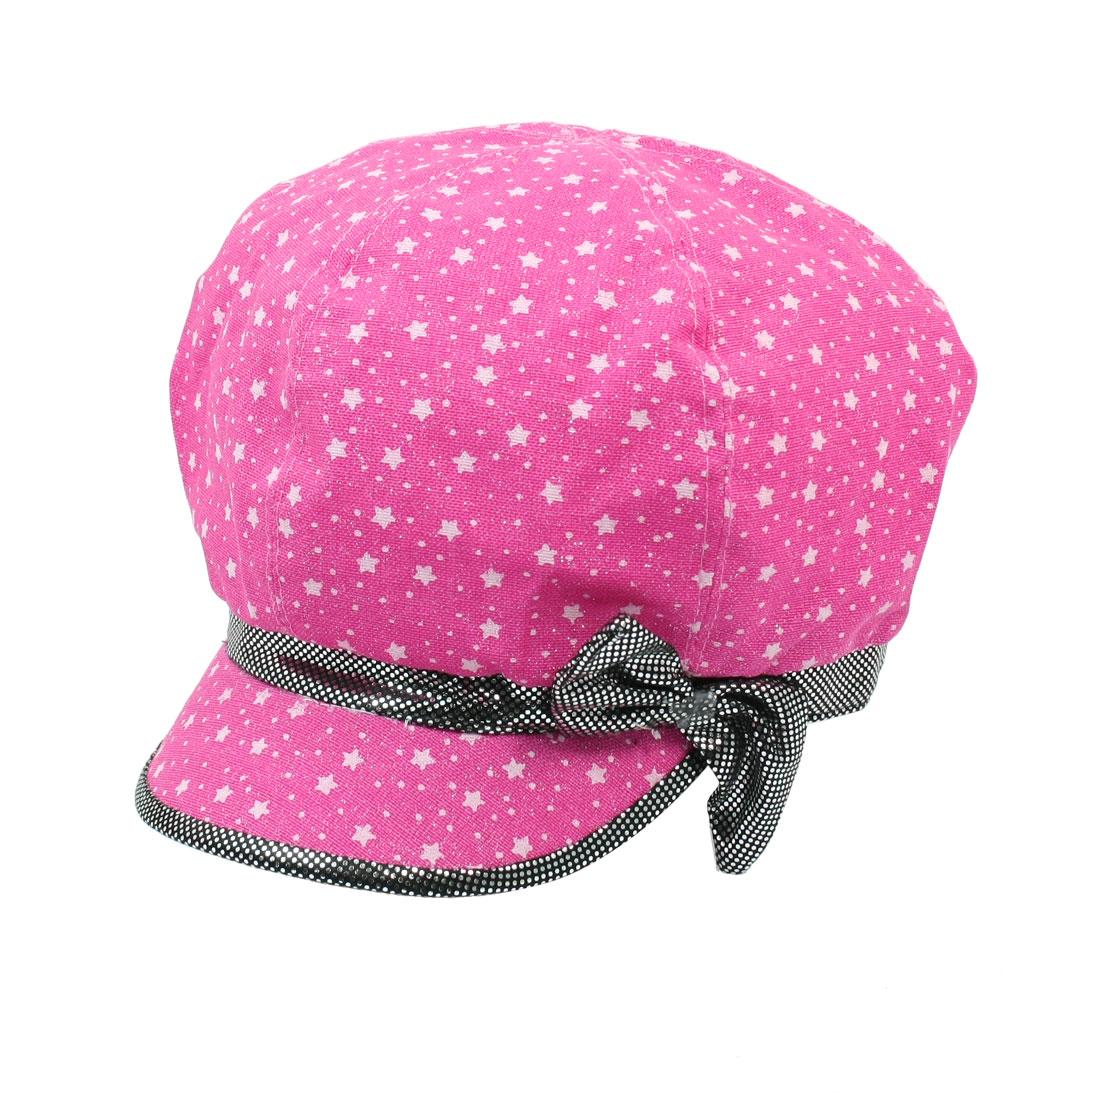 Stars Dots Bowtie Printed Cap Casual Casquette Hat Fuchsia Size L for Ladies